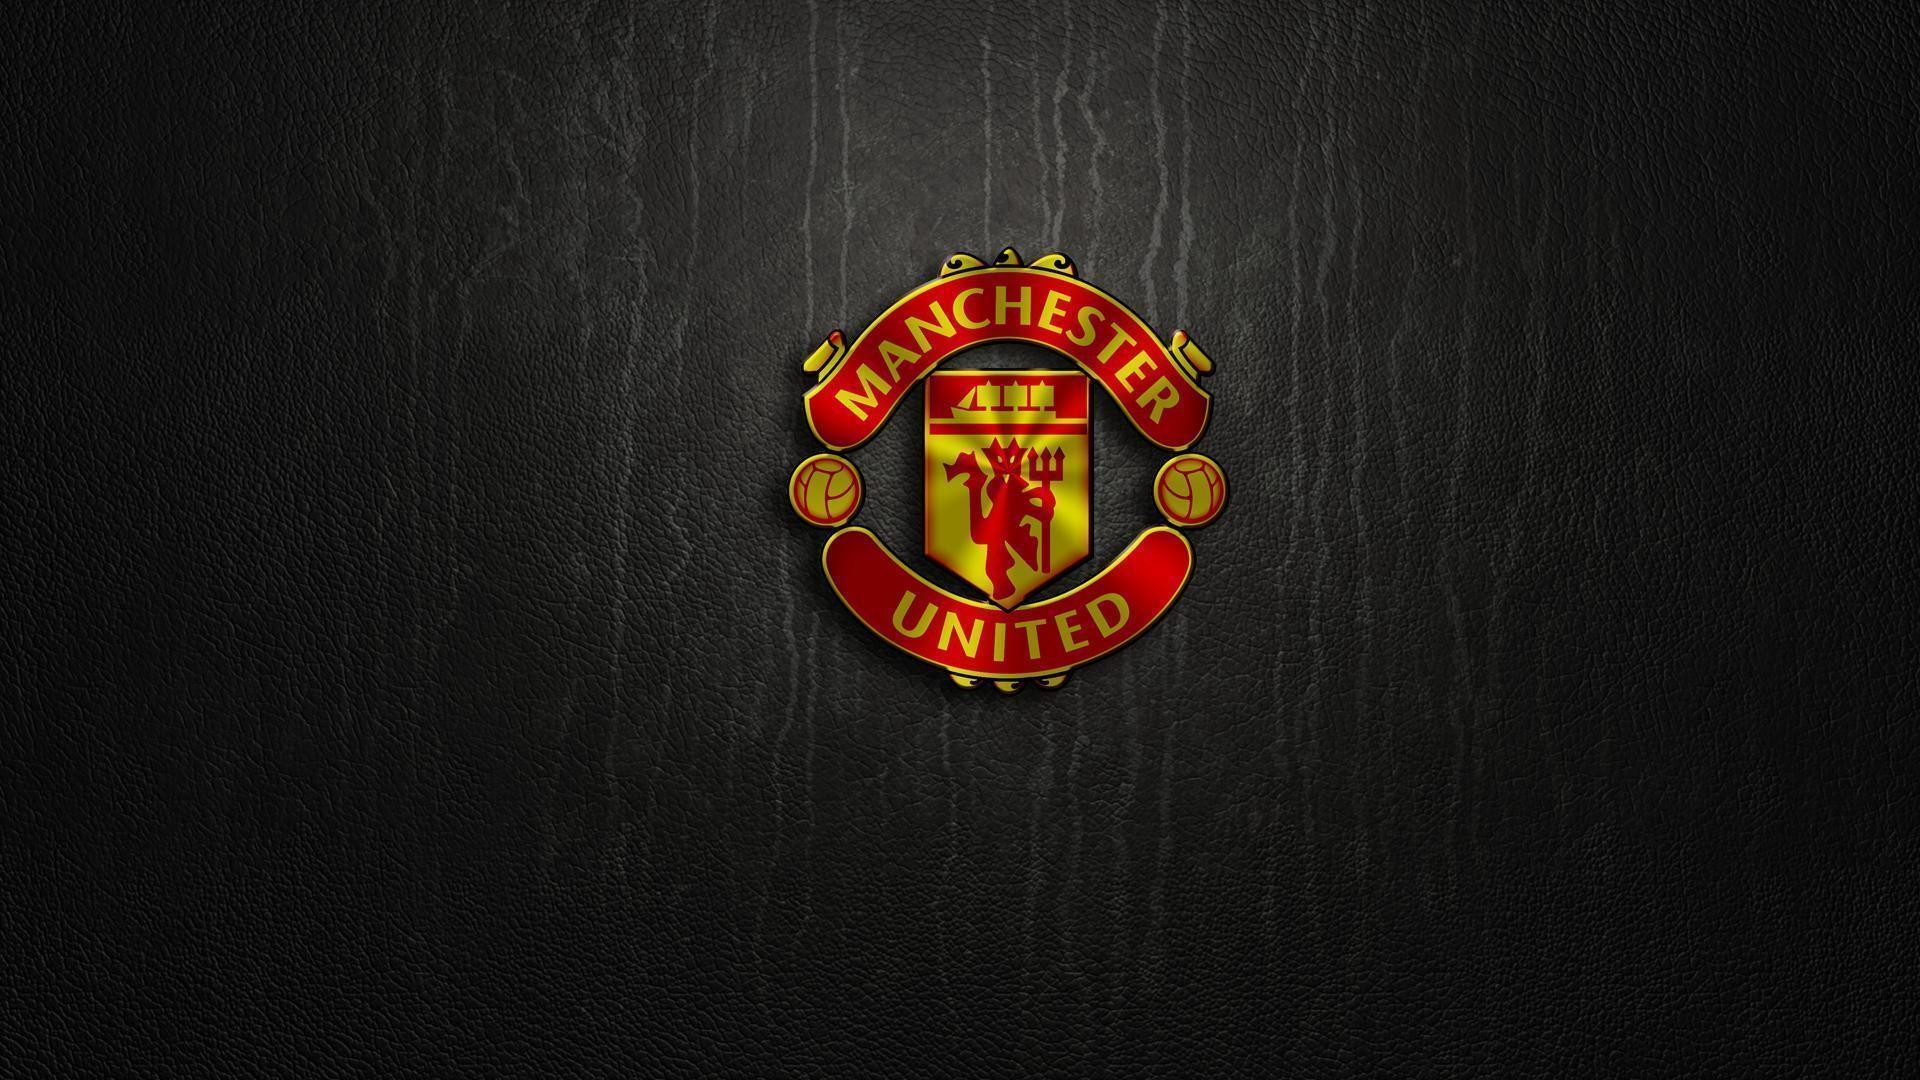 Manchester United Wallpaper Manchester United Best Wallpaper Hd